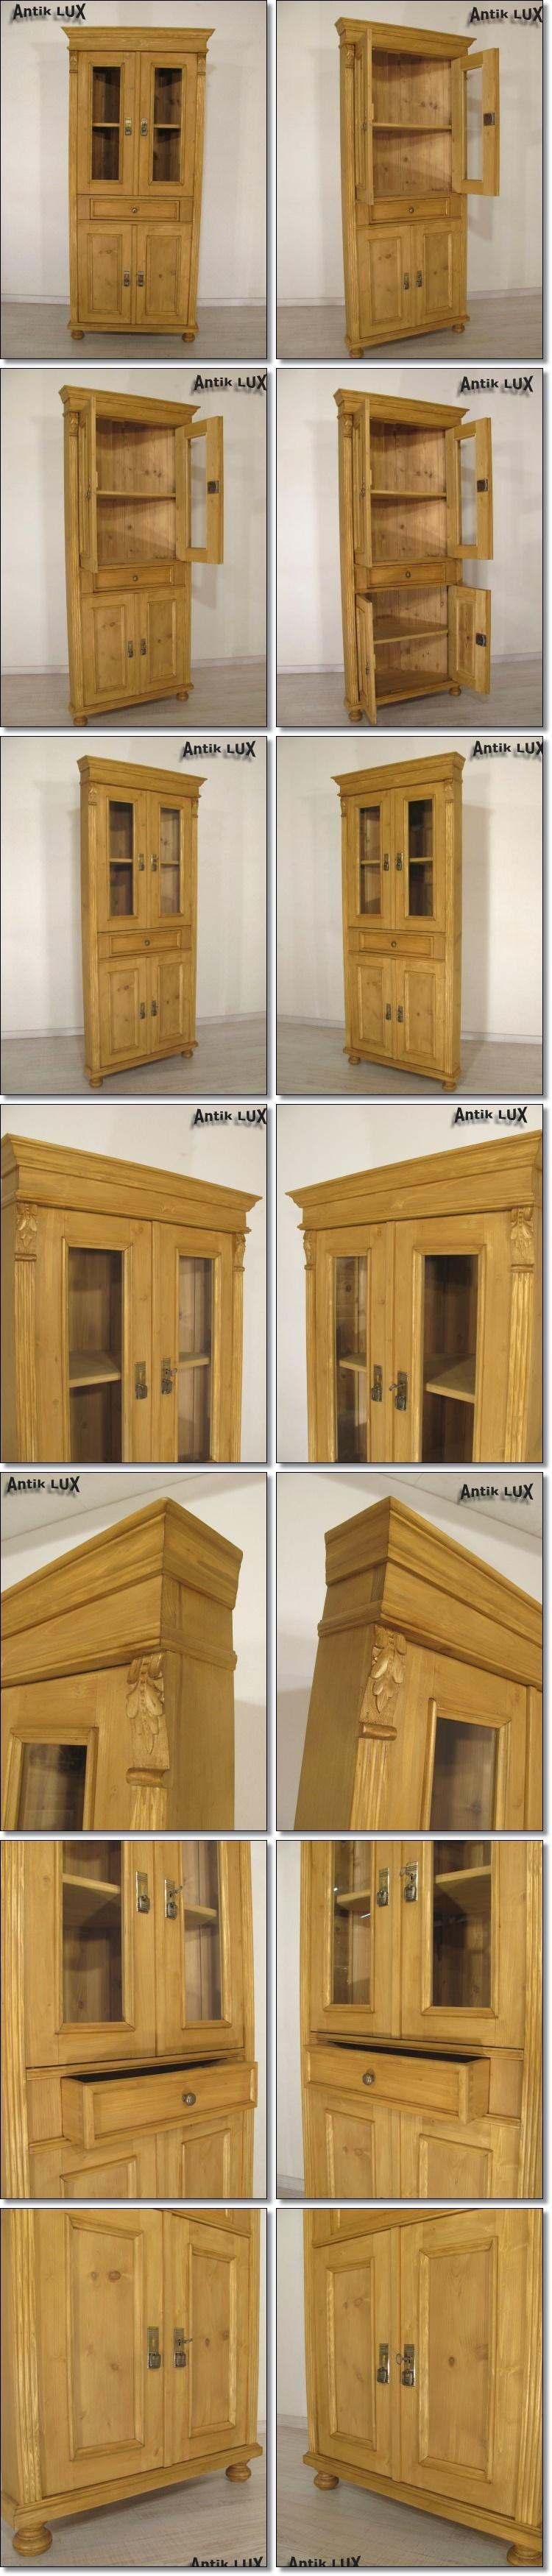 jugendstil eckschrank weichholz kommode vertiko anrichte schrank antik lux ebay. Black Bedroom Furniture Sets. Home Design Ideas